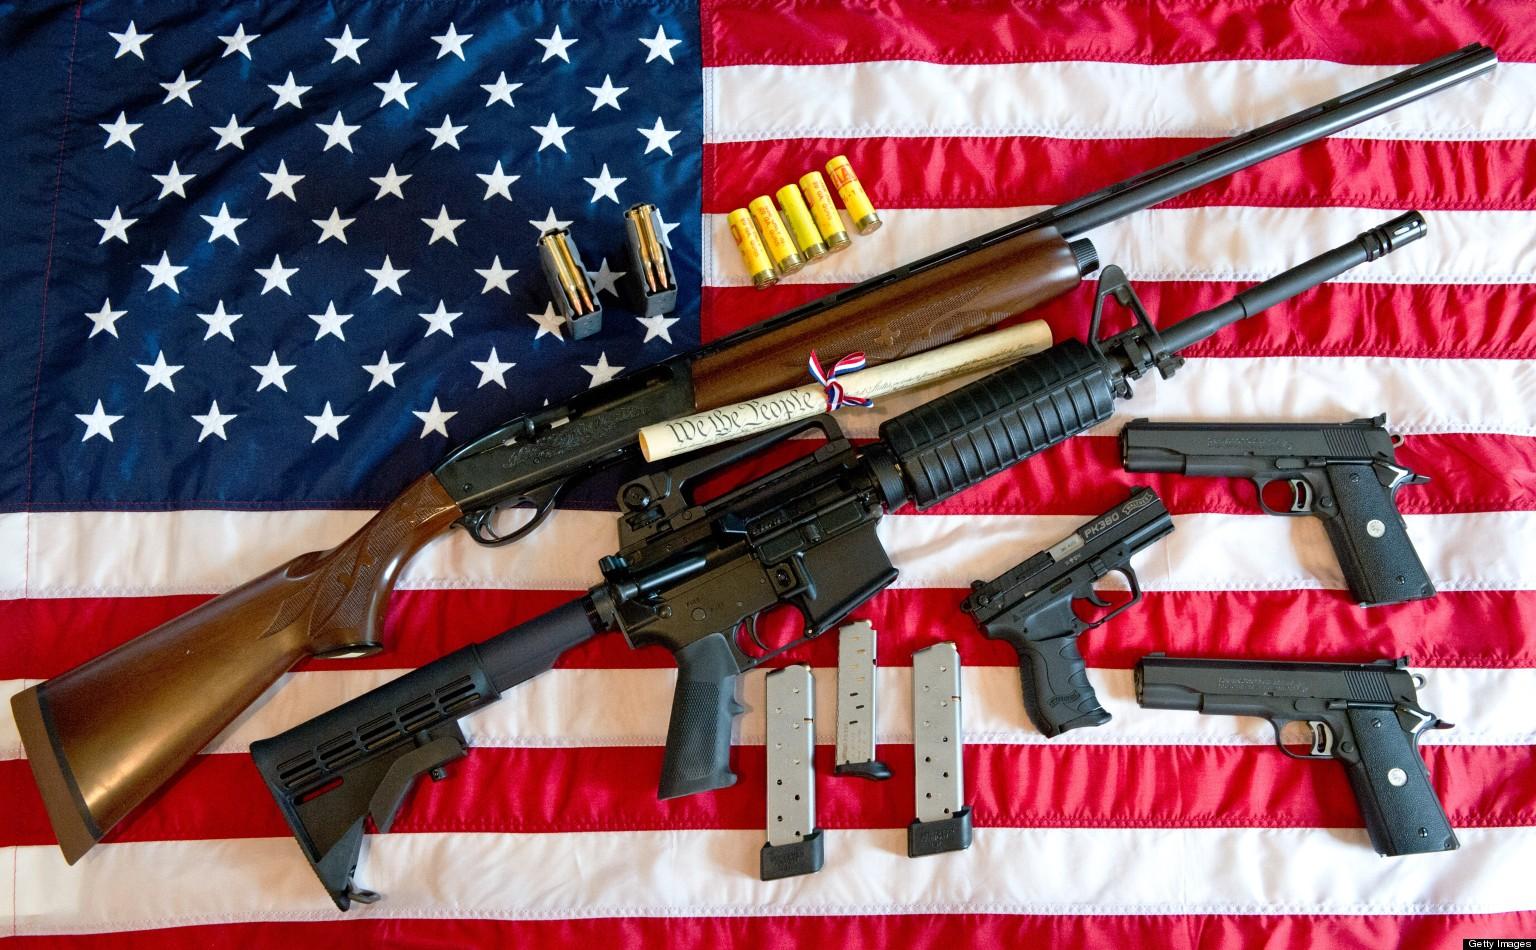 downside to gun control